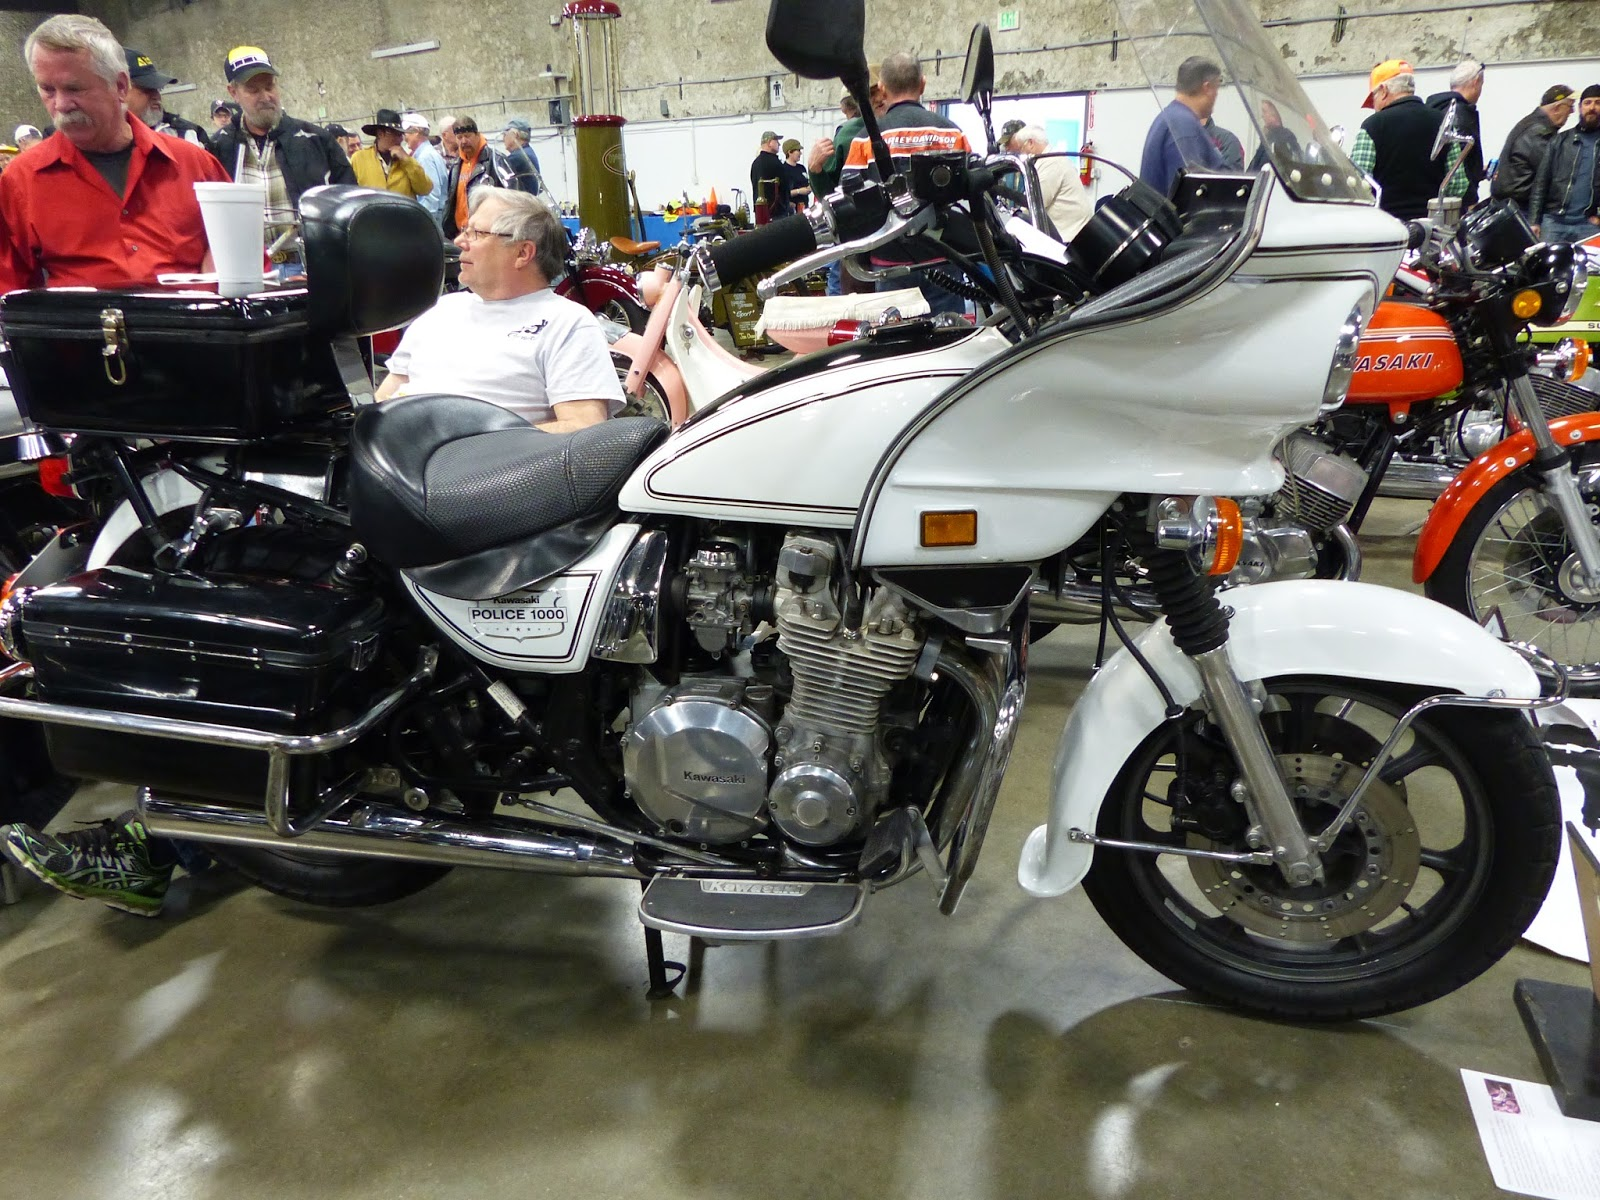 OldMotoDude: Kawasaki KZ1000 Police Bike on display at the